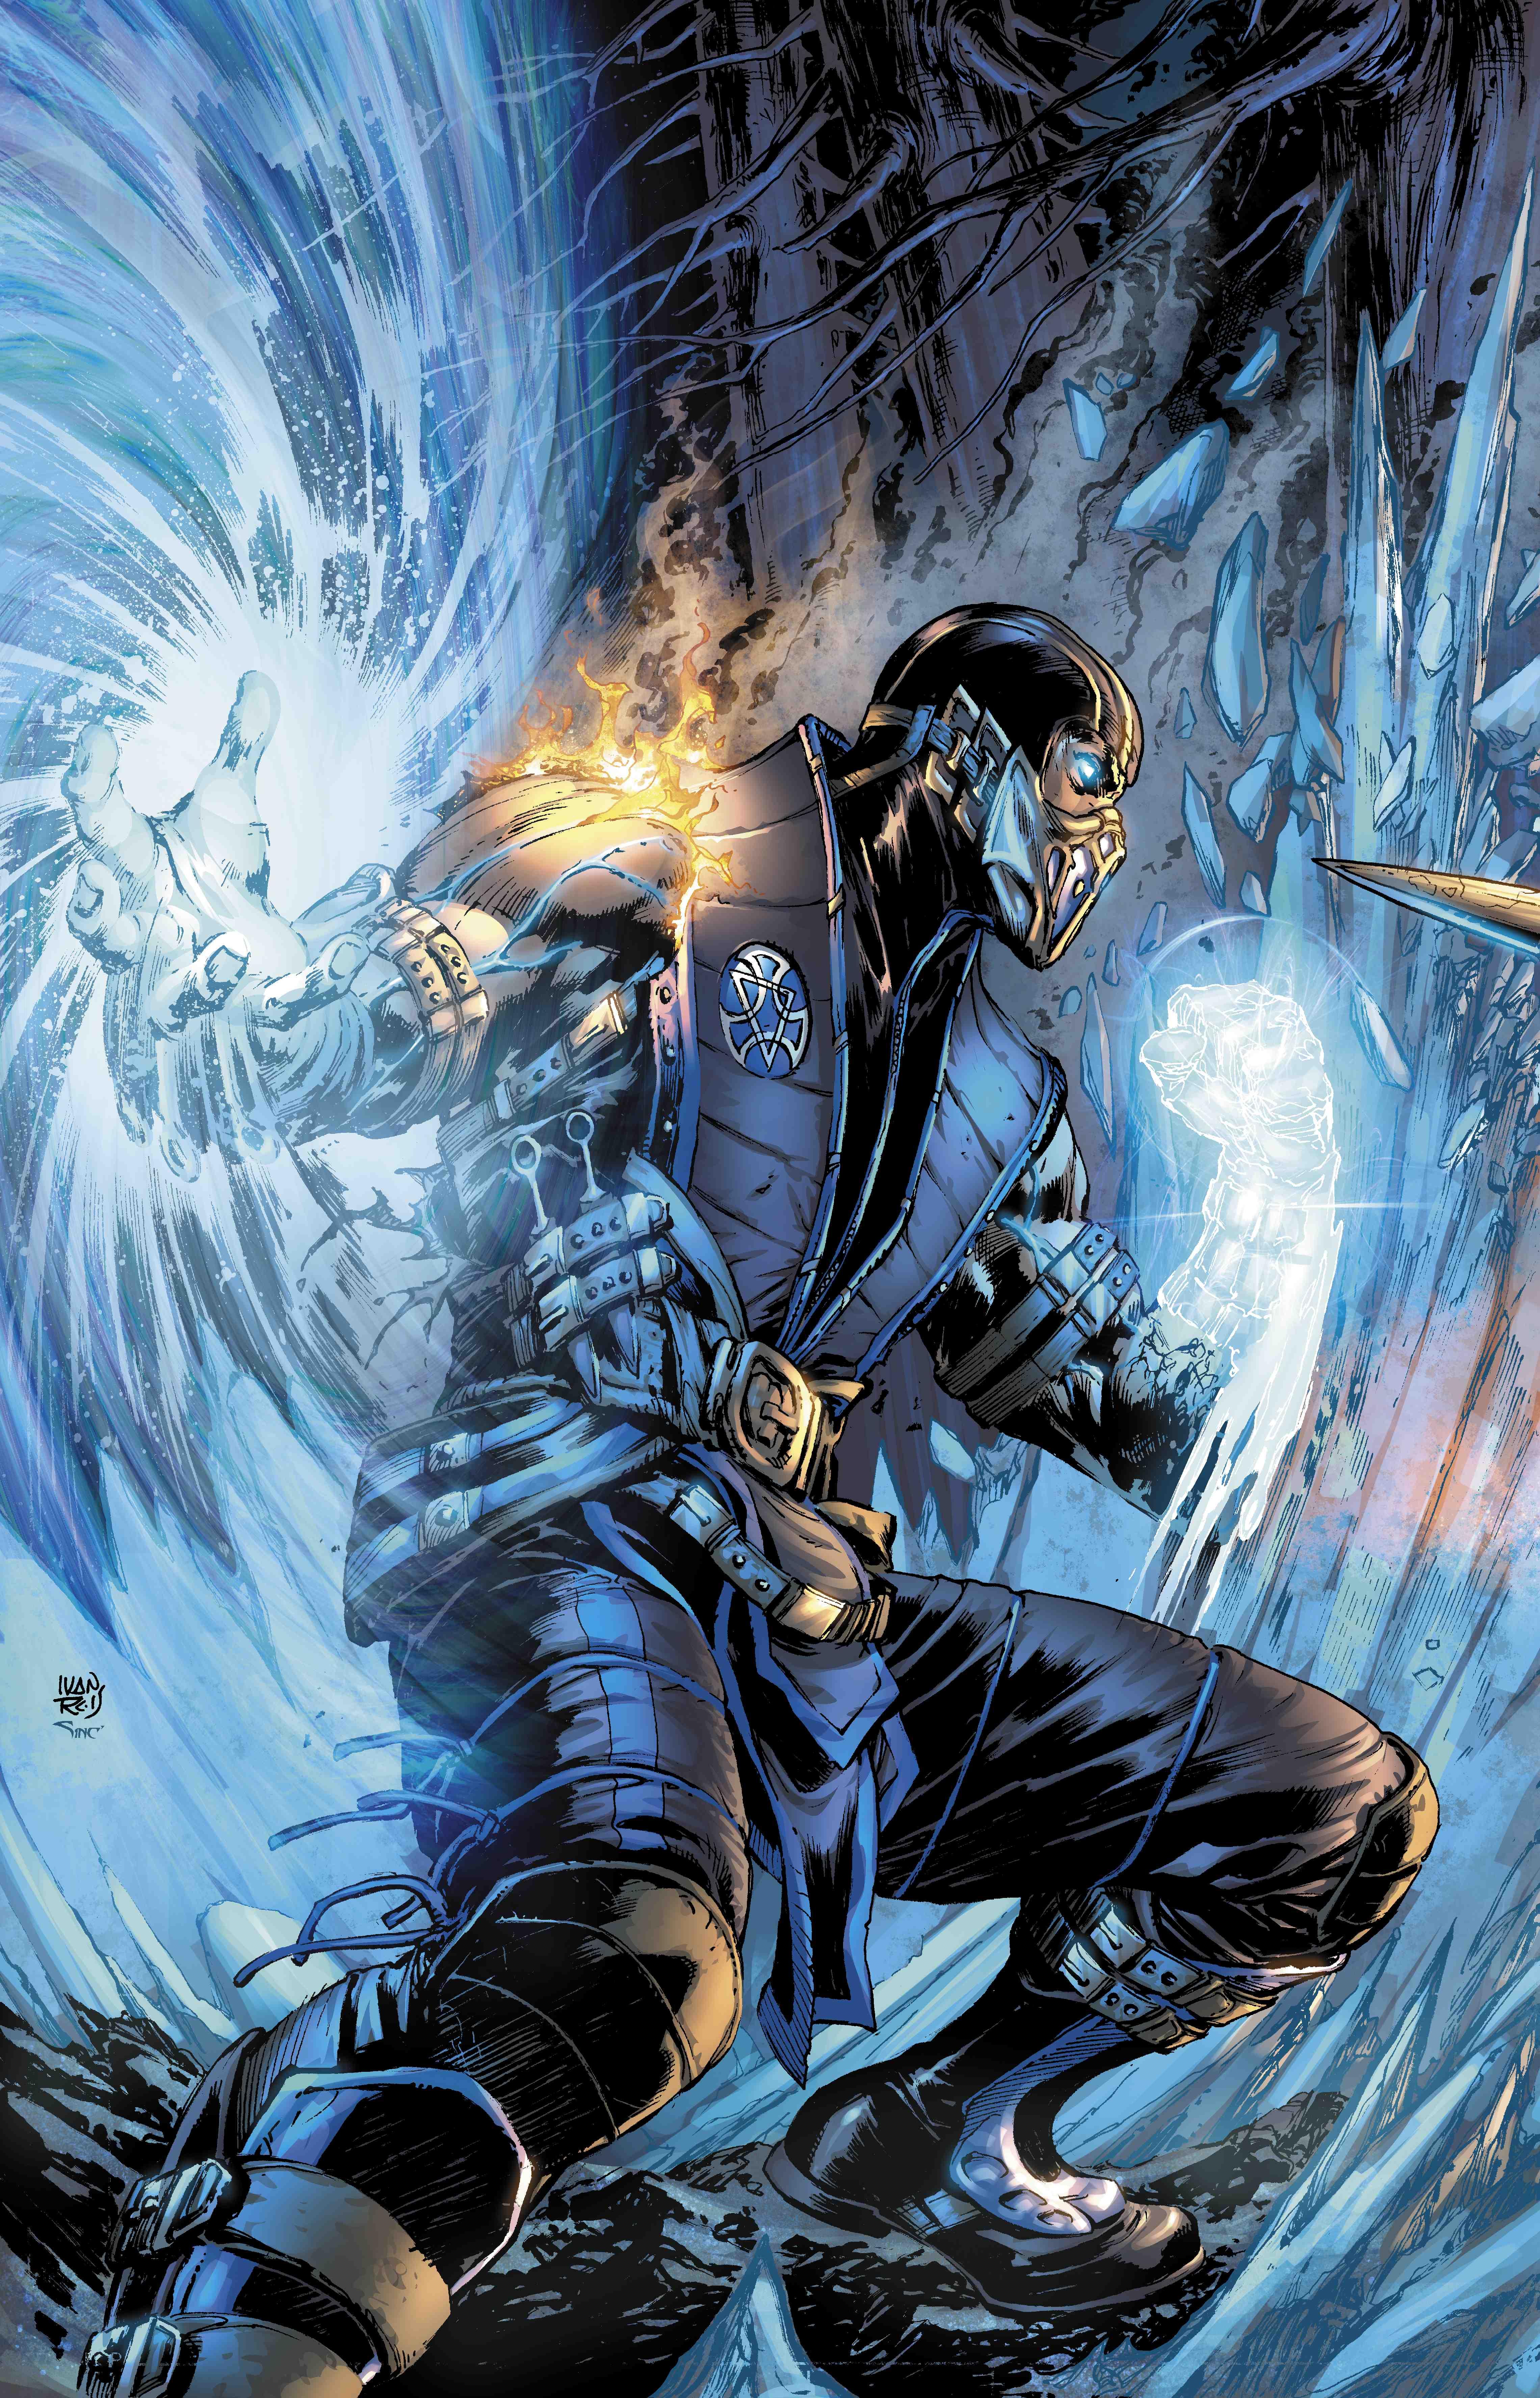 Mortal Kombat subzero art